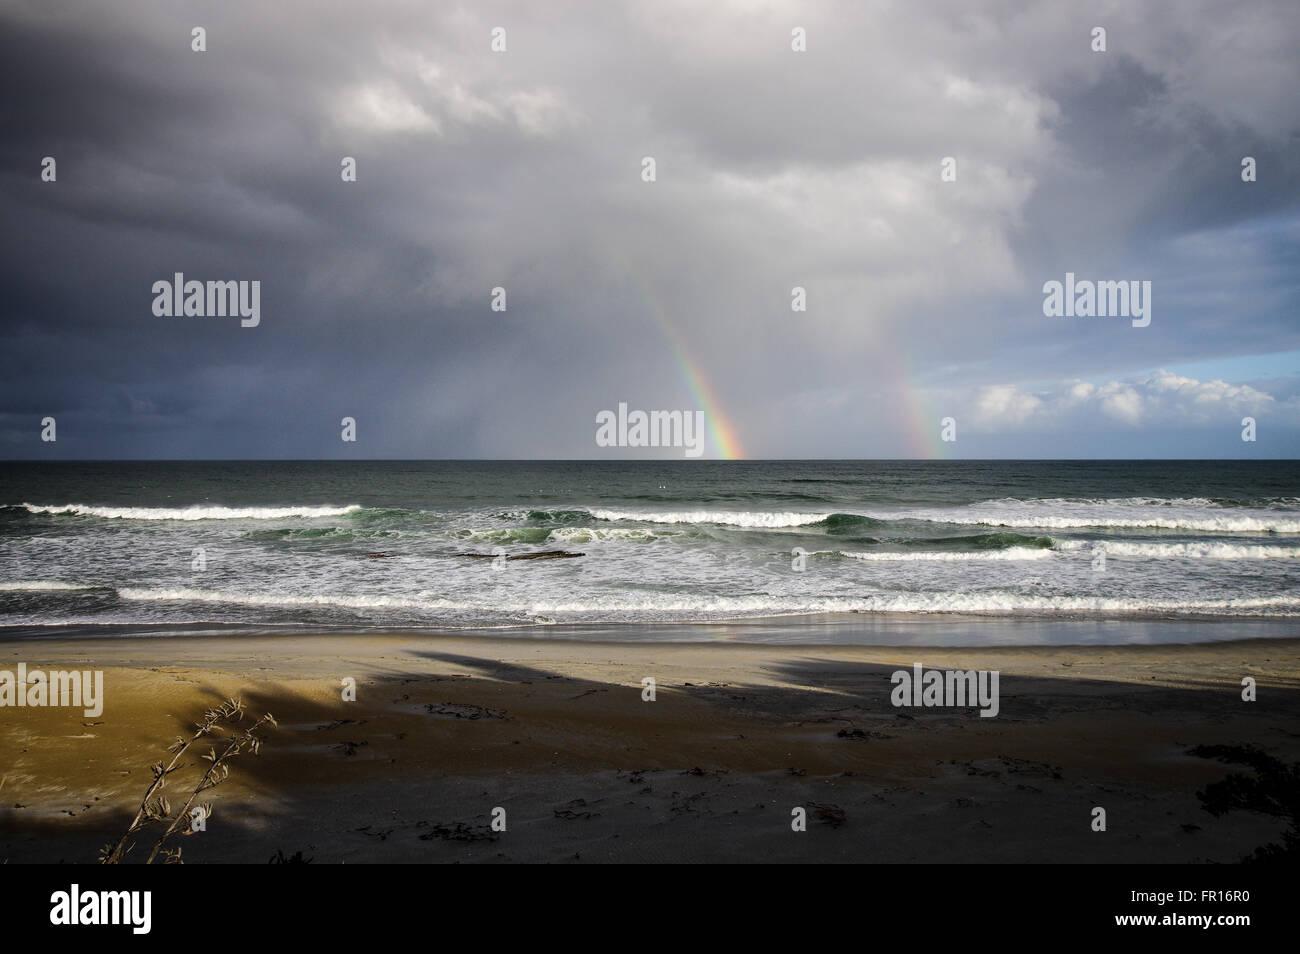 Double rainbow over Kuri Bush Beach - Otago, New Zealand Stock Photo